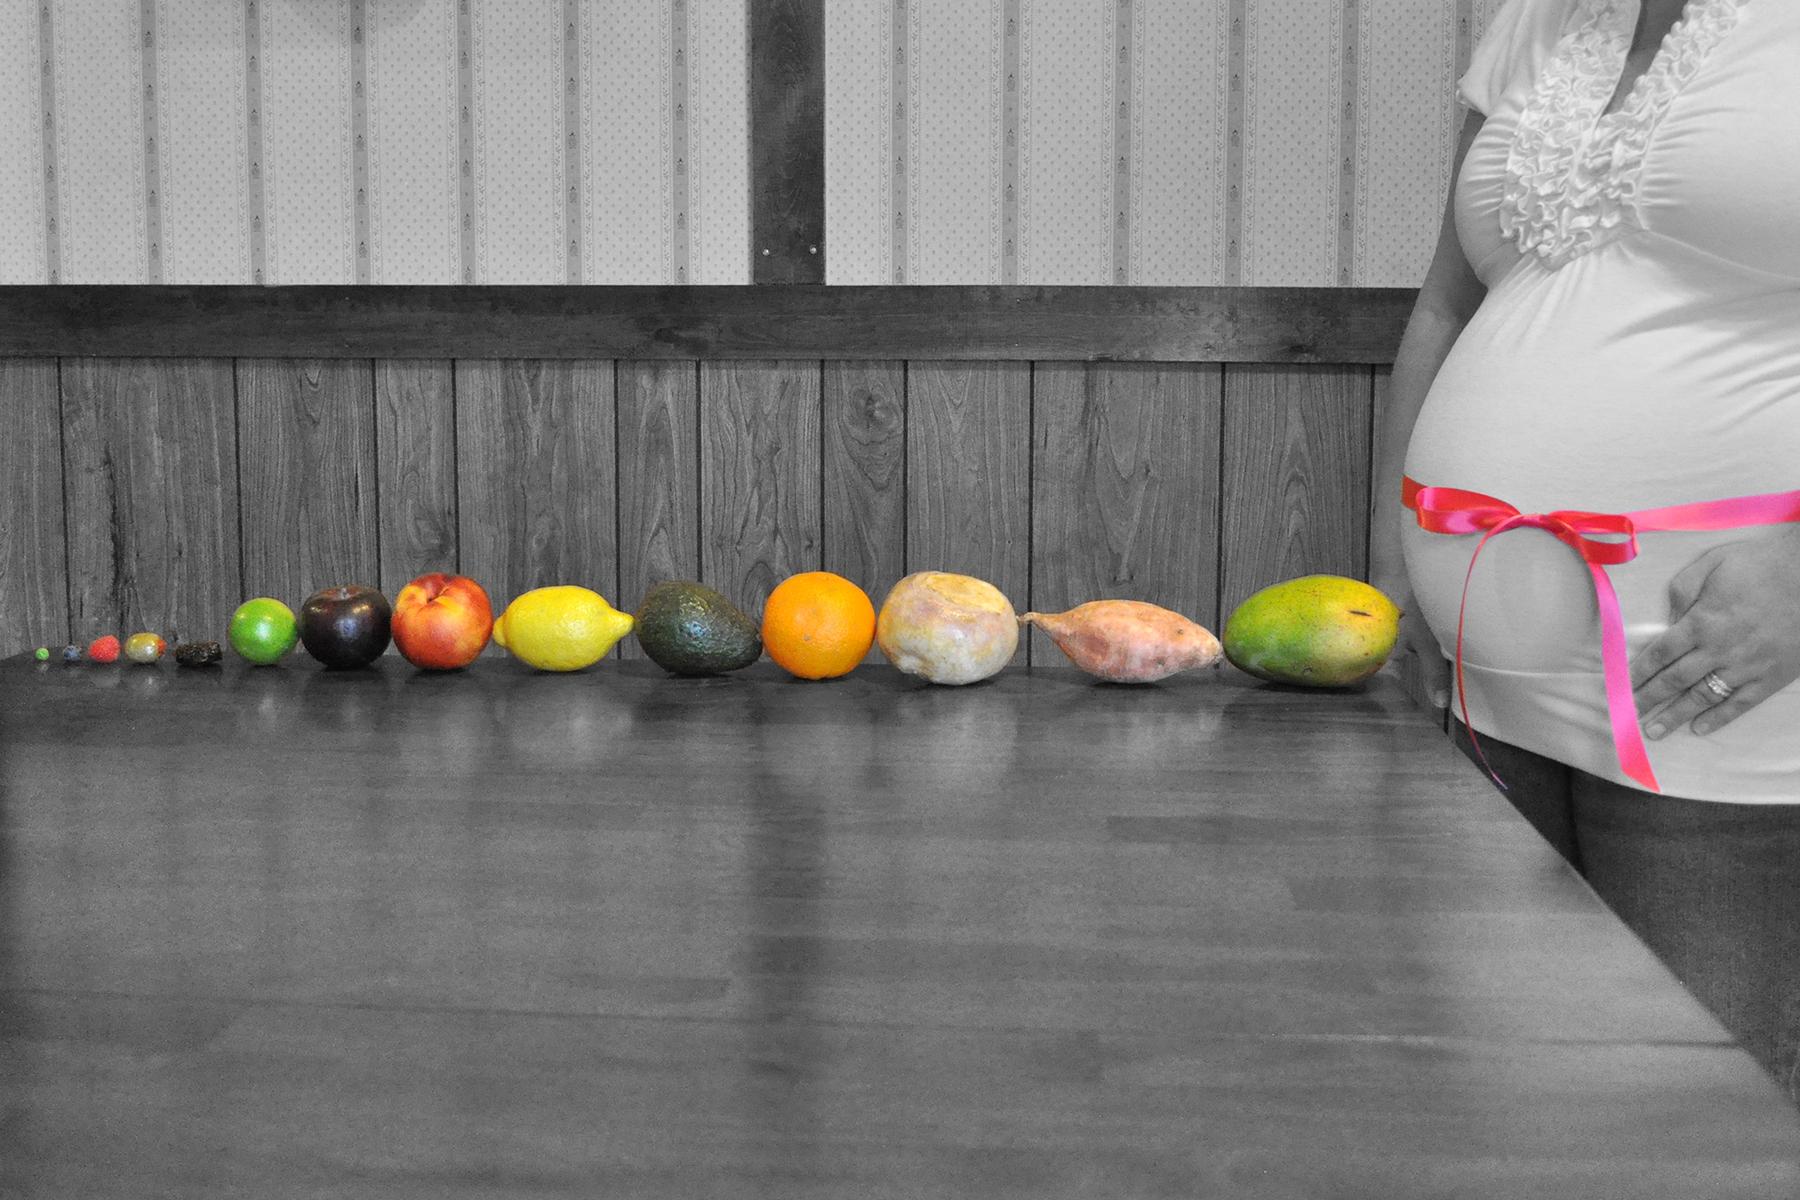 2014-09-12_lemke-fruit